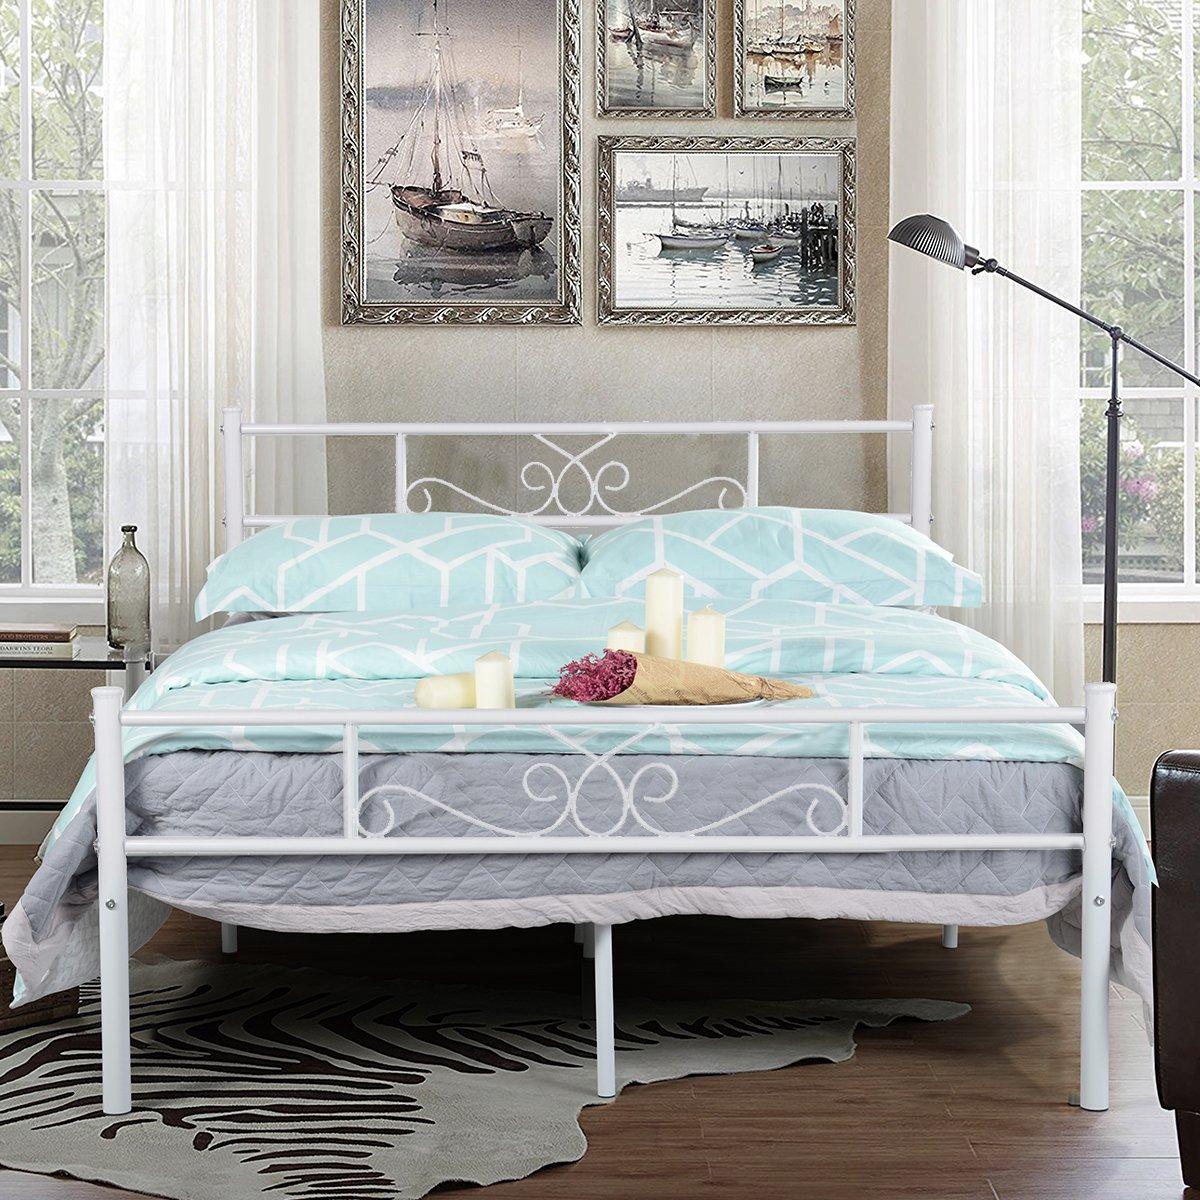 Amazon.com: SimLife Full Size White Metal Bed Frame Headboard ...